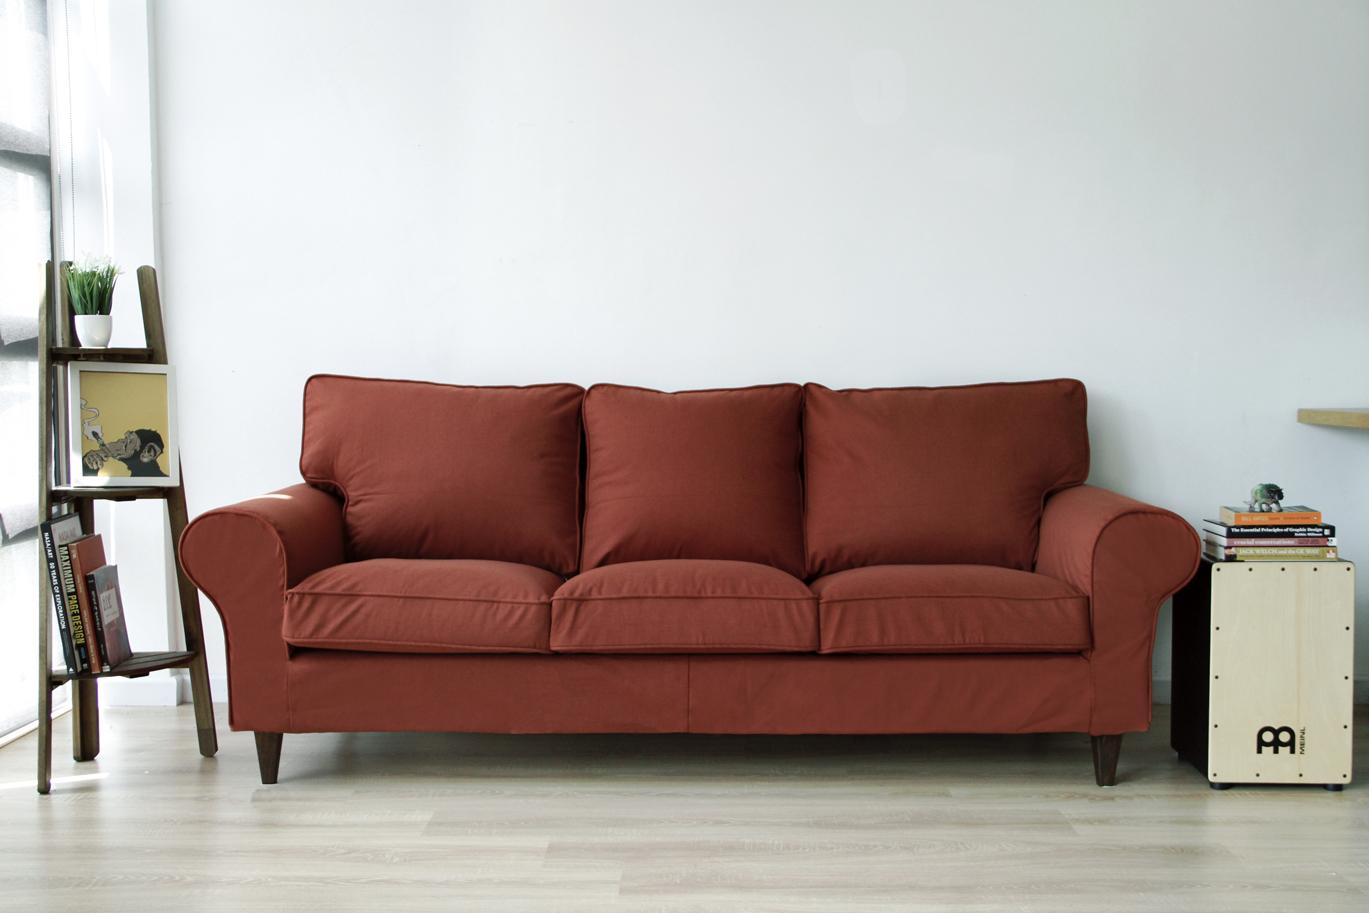 IKEA Ektorp Sofa Bezug von Comfort Works